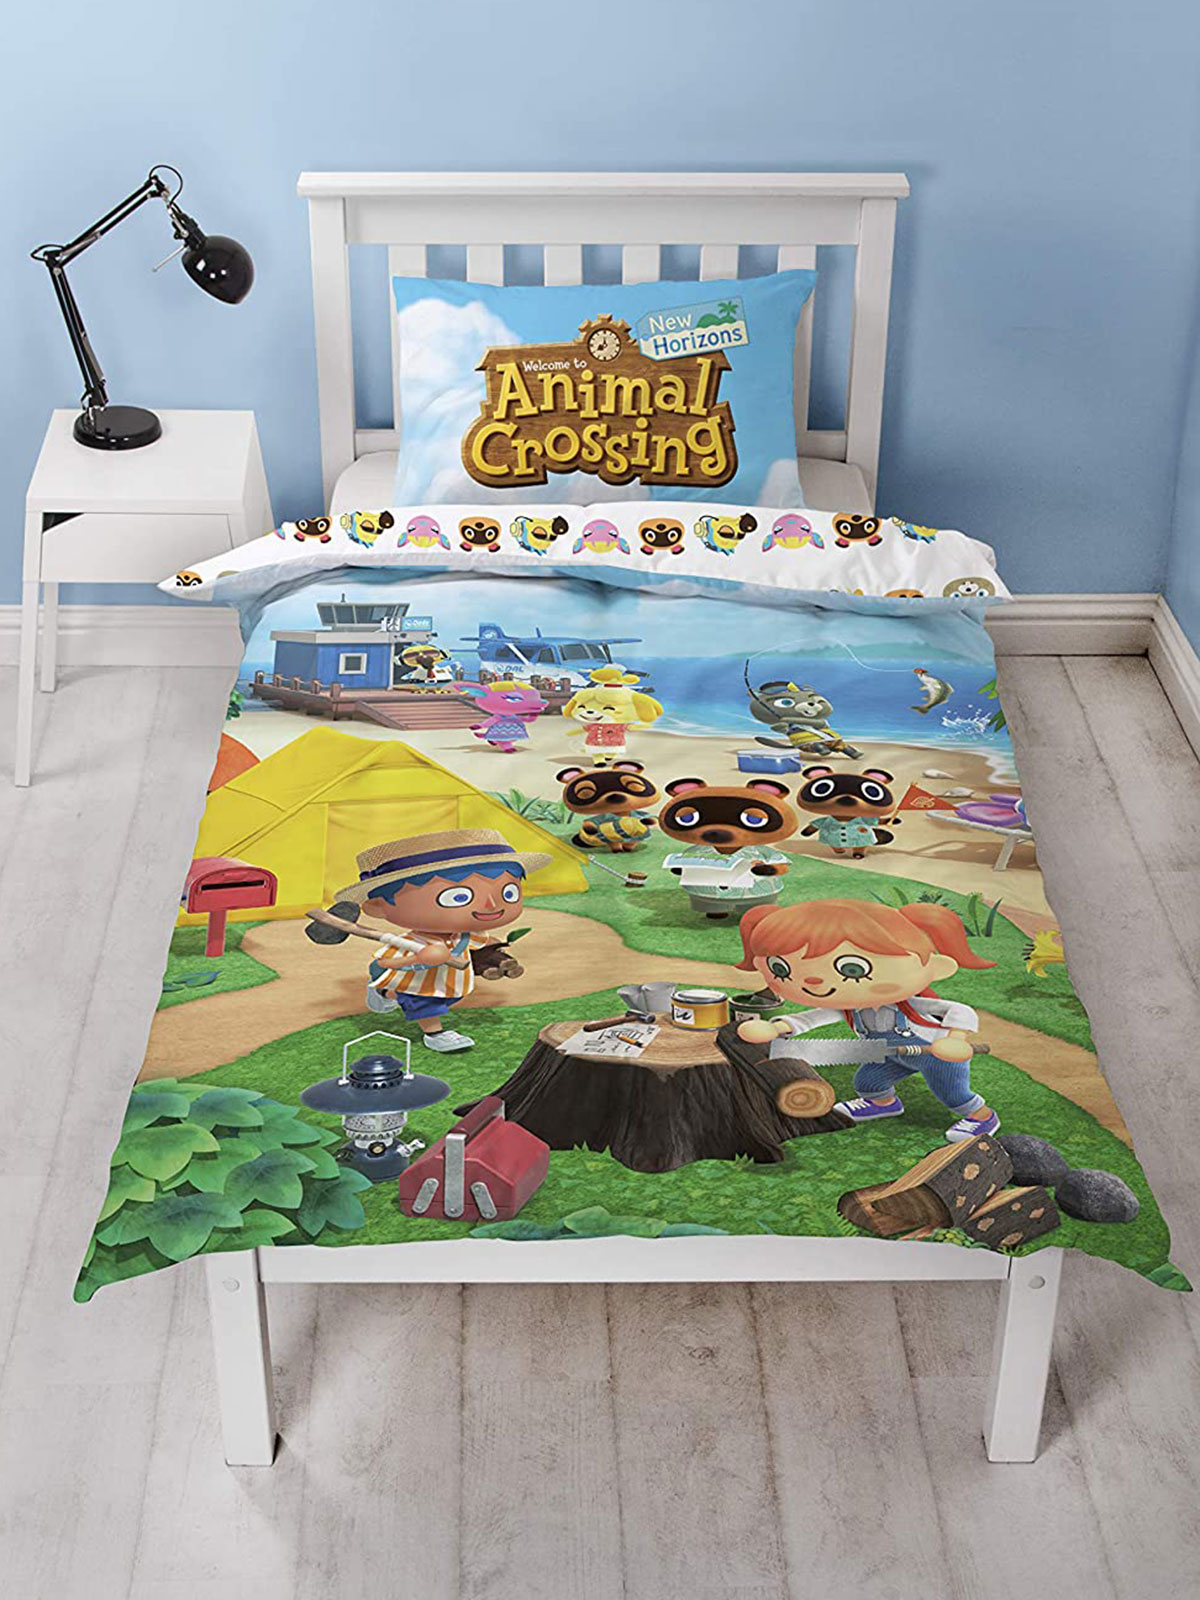 Animal Crossing Single Duvet Cover and Pillowcase Set